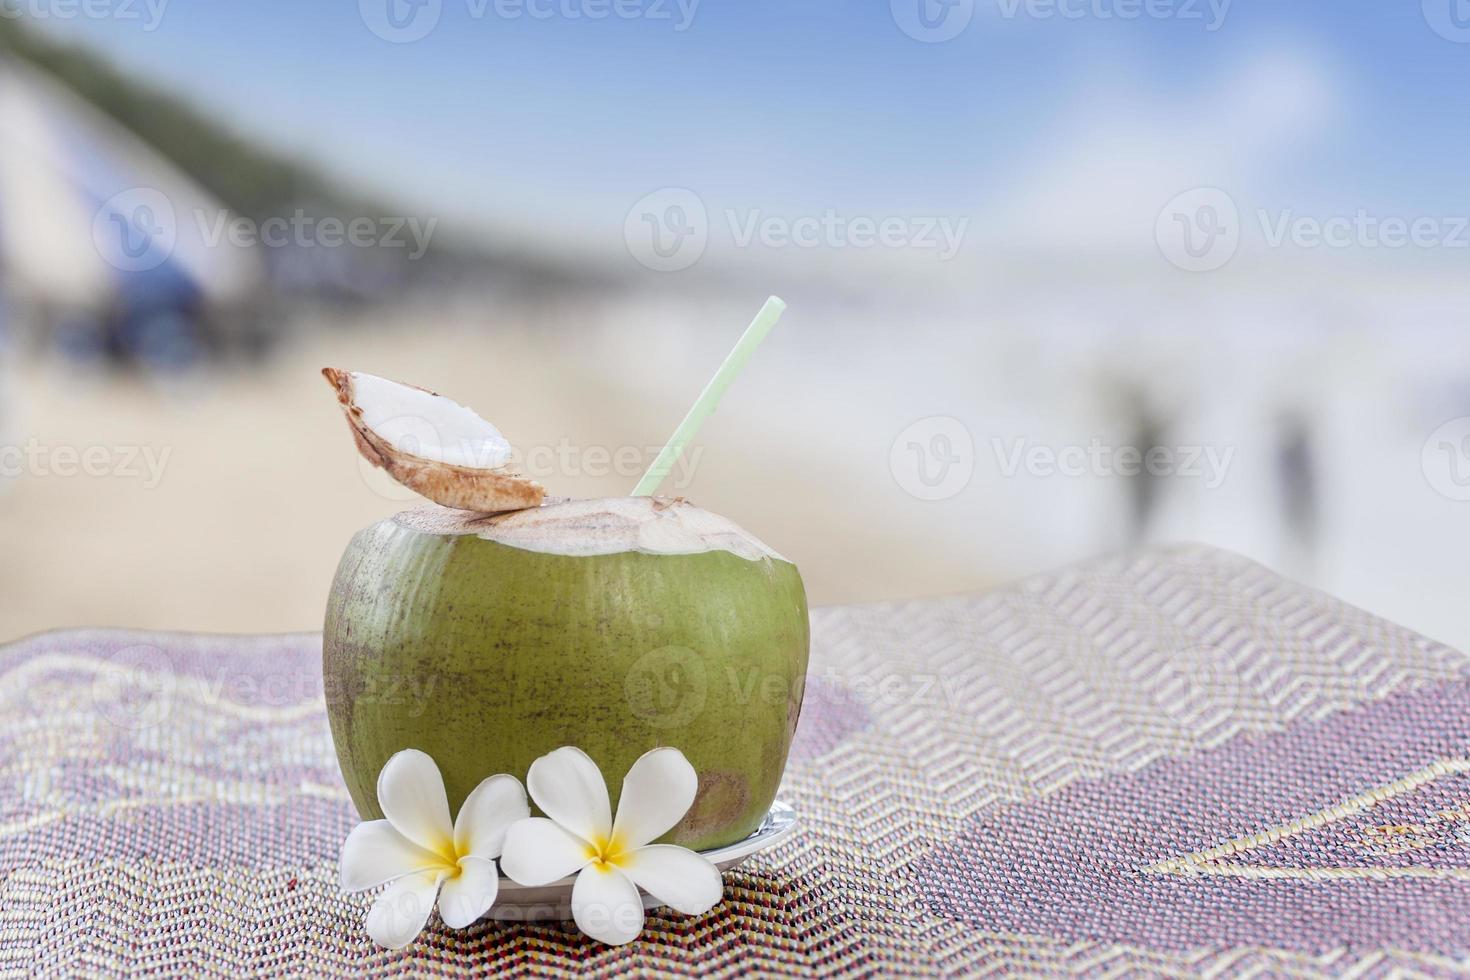 junges Kokosnussfrischgetränk foto